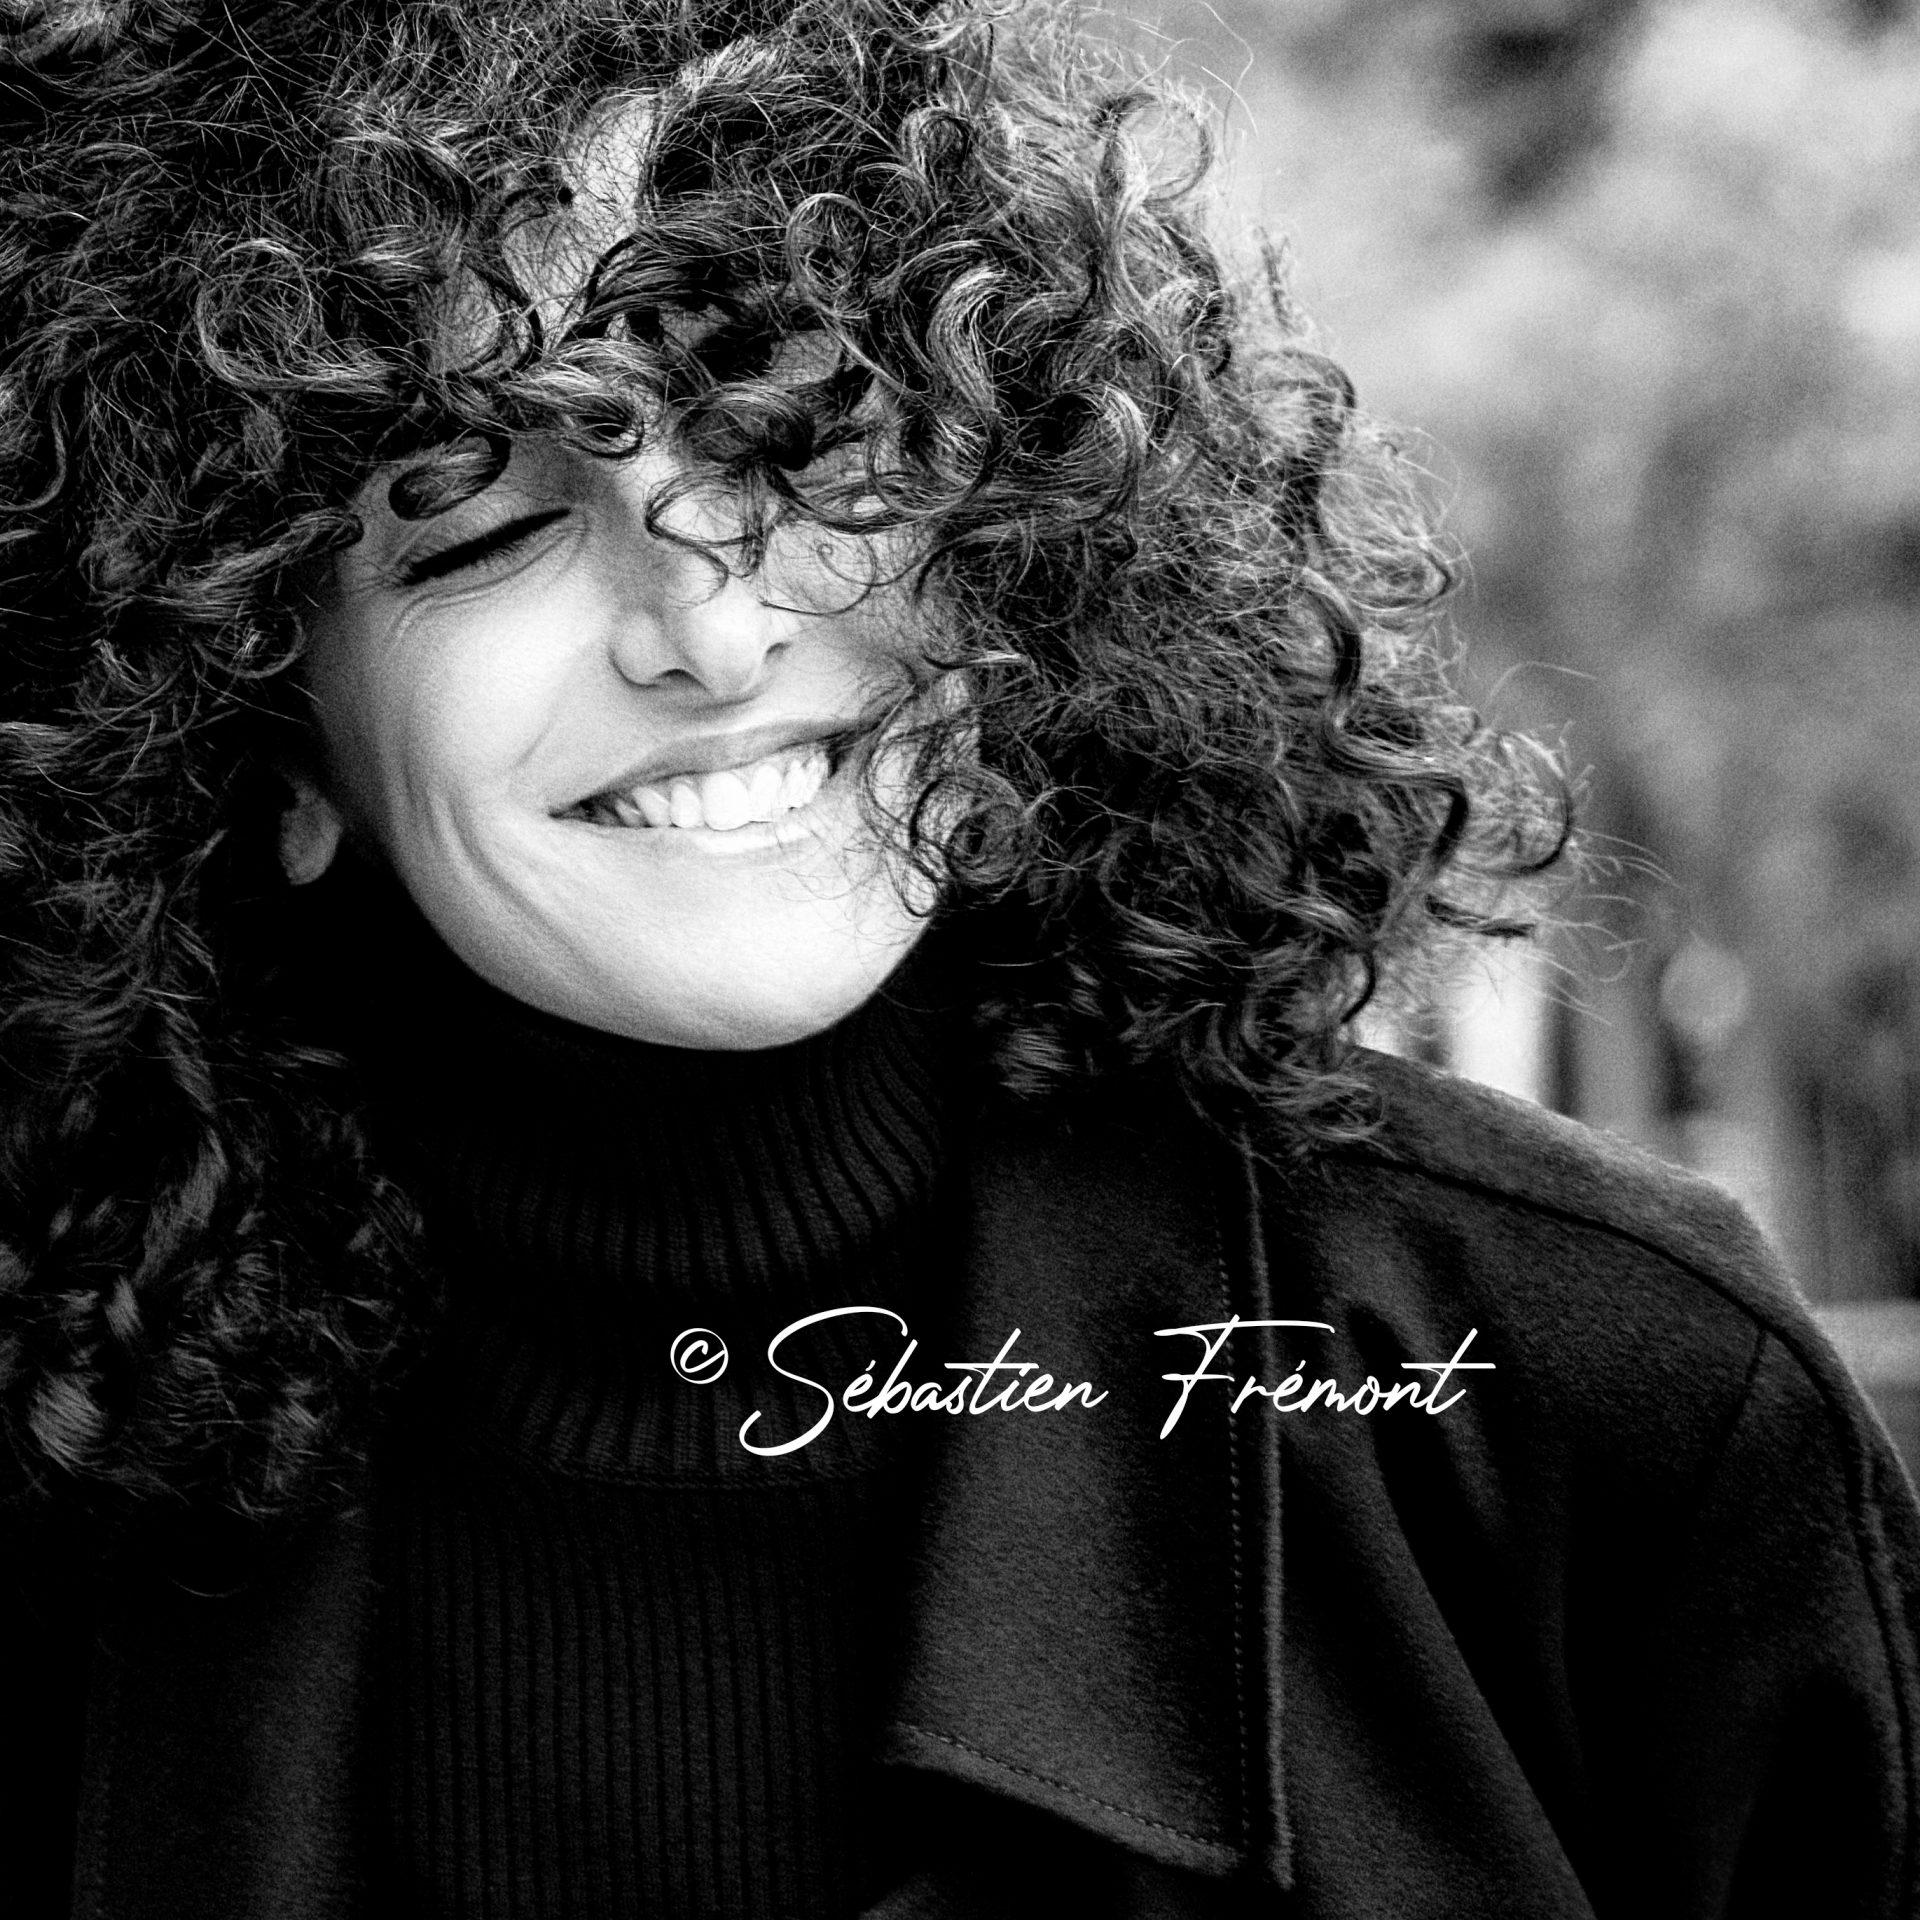 French Photographer Portrait Photography Brune Buonomano / Paco Rabanne